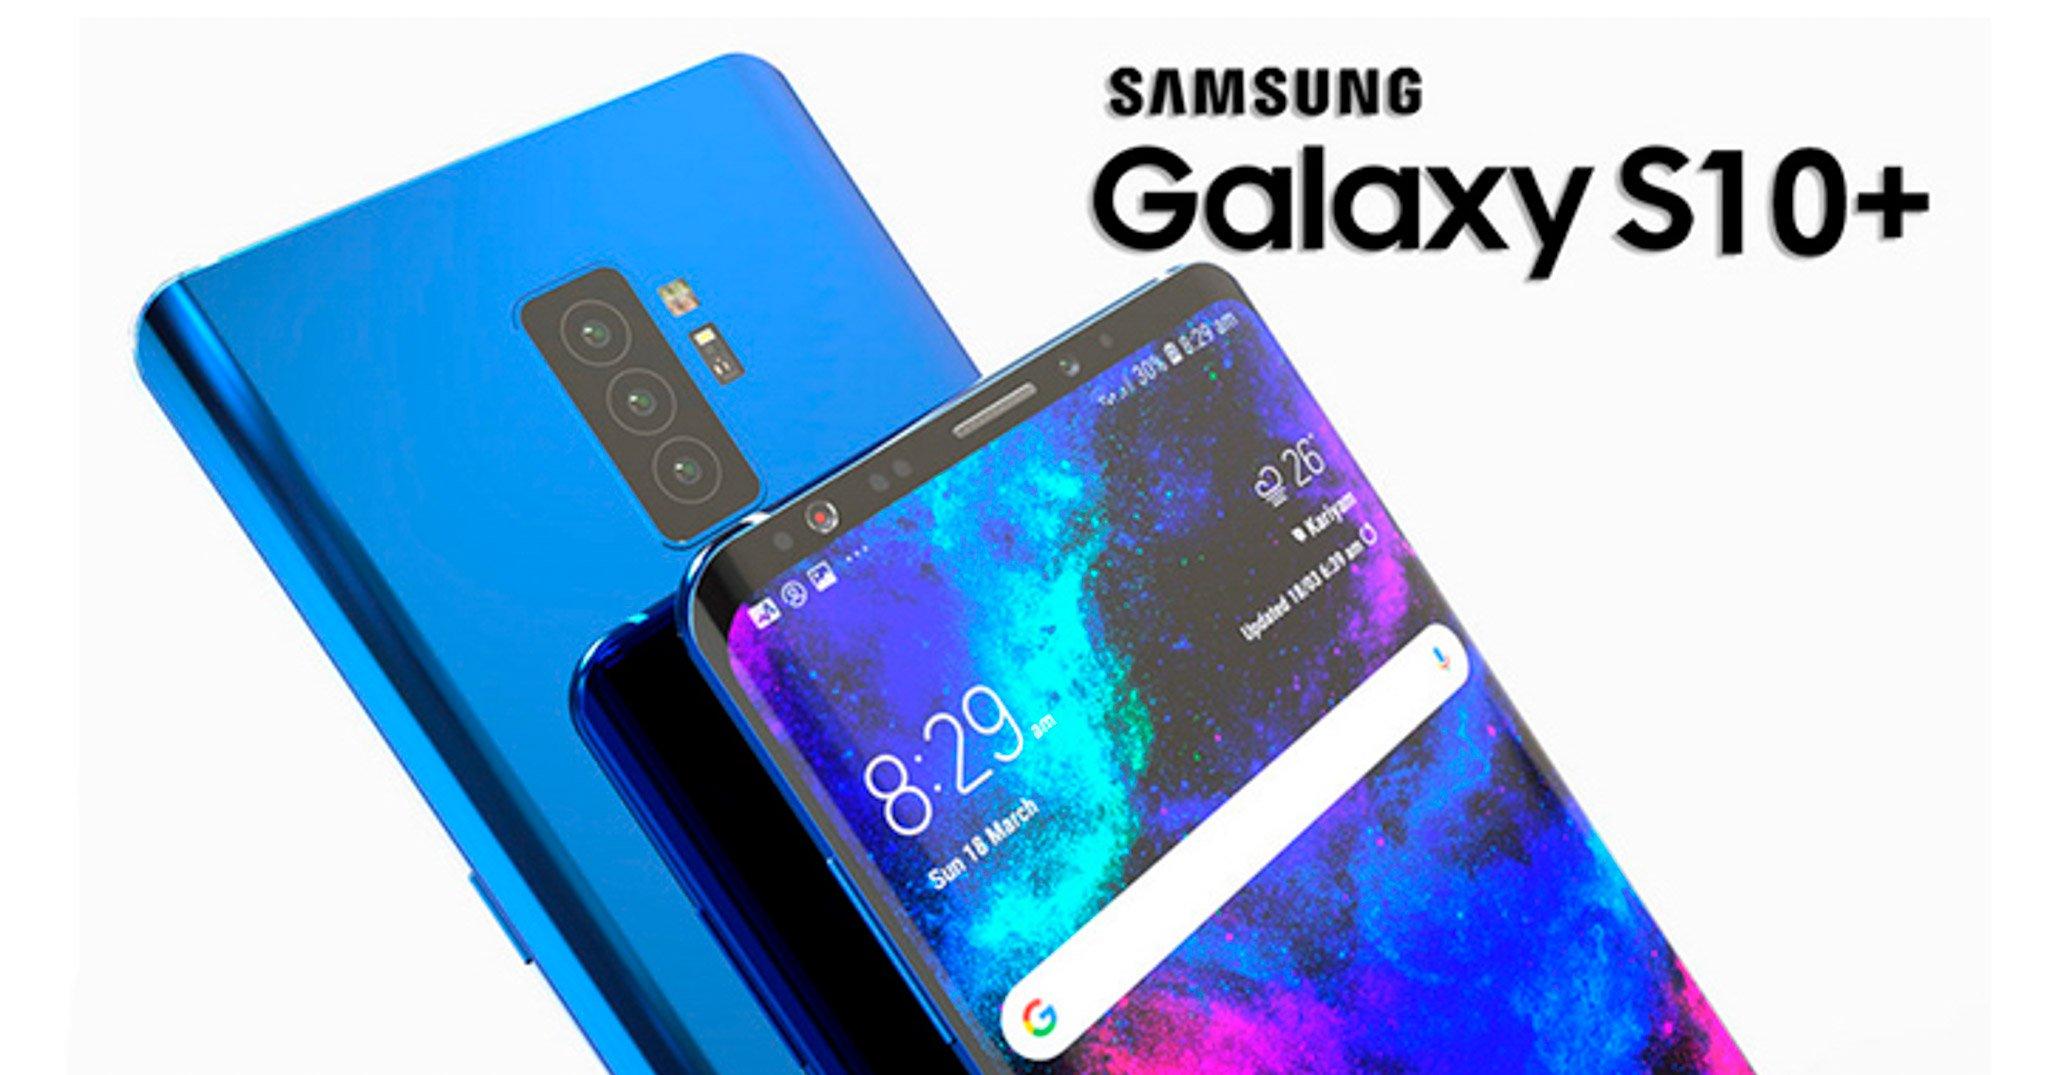 iPhone X Plus và SamSung Galaxy S10 iphone x plus và samsung galaxy s10 - Tính năng mới trên iPhone X Plus và SamSung Galaxy S10